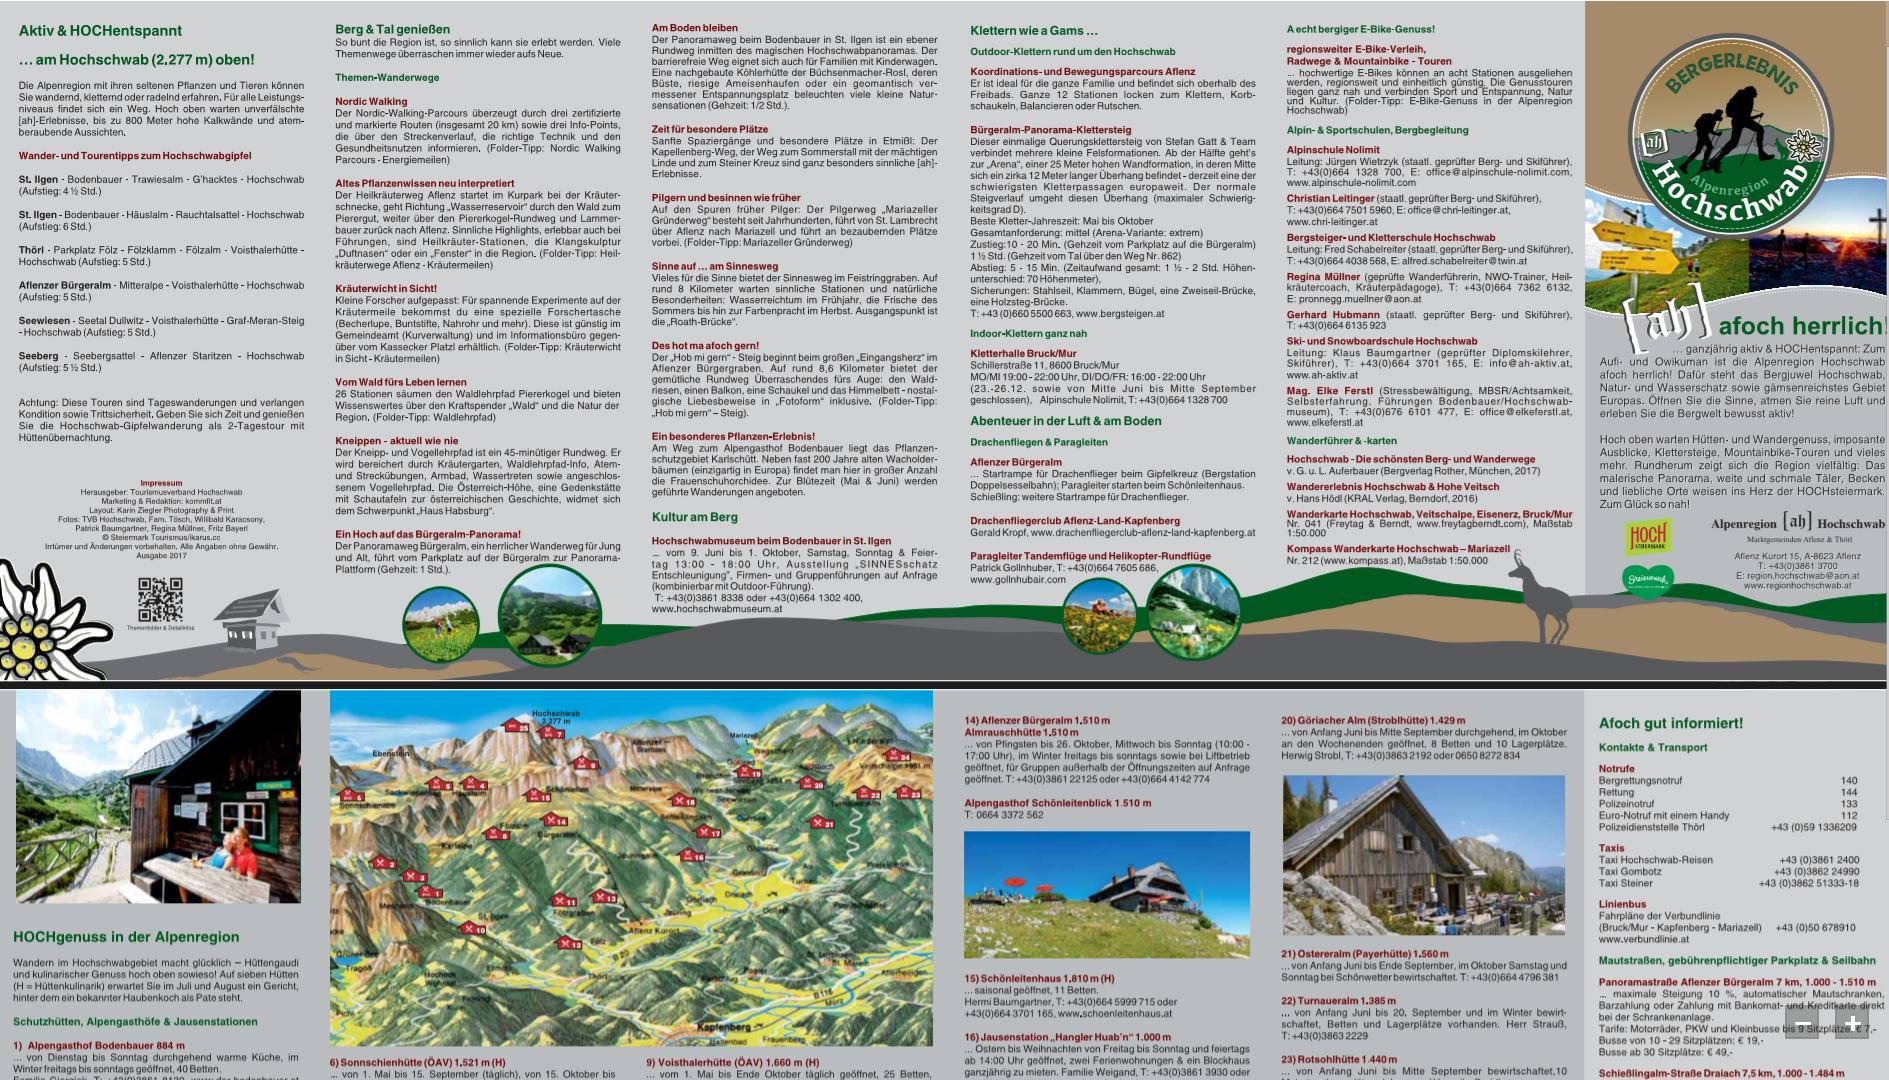 Bergerlebnis neu: Folderkonzeption, Full Service, Tourismusverband Alpenregion Hochschwab